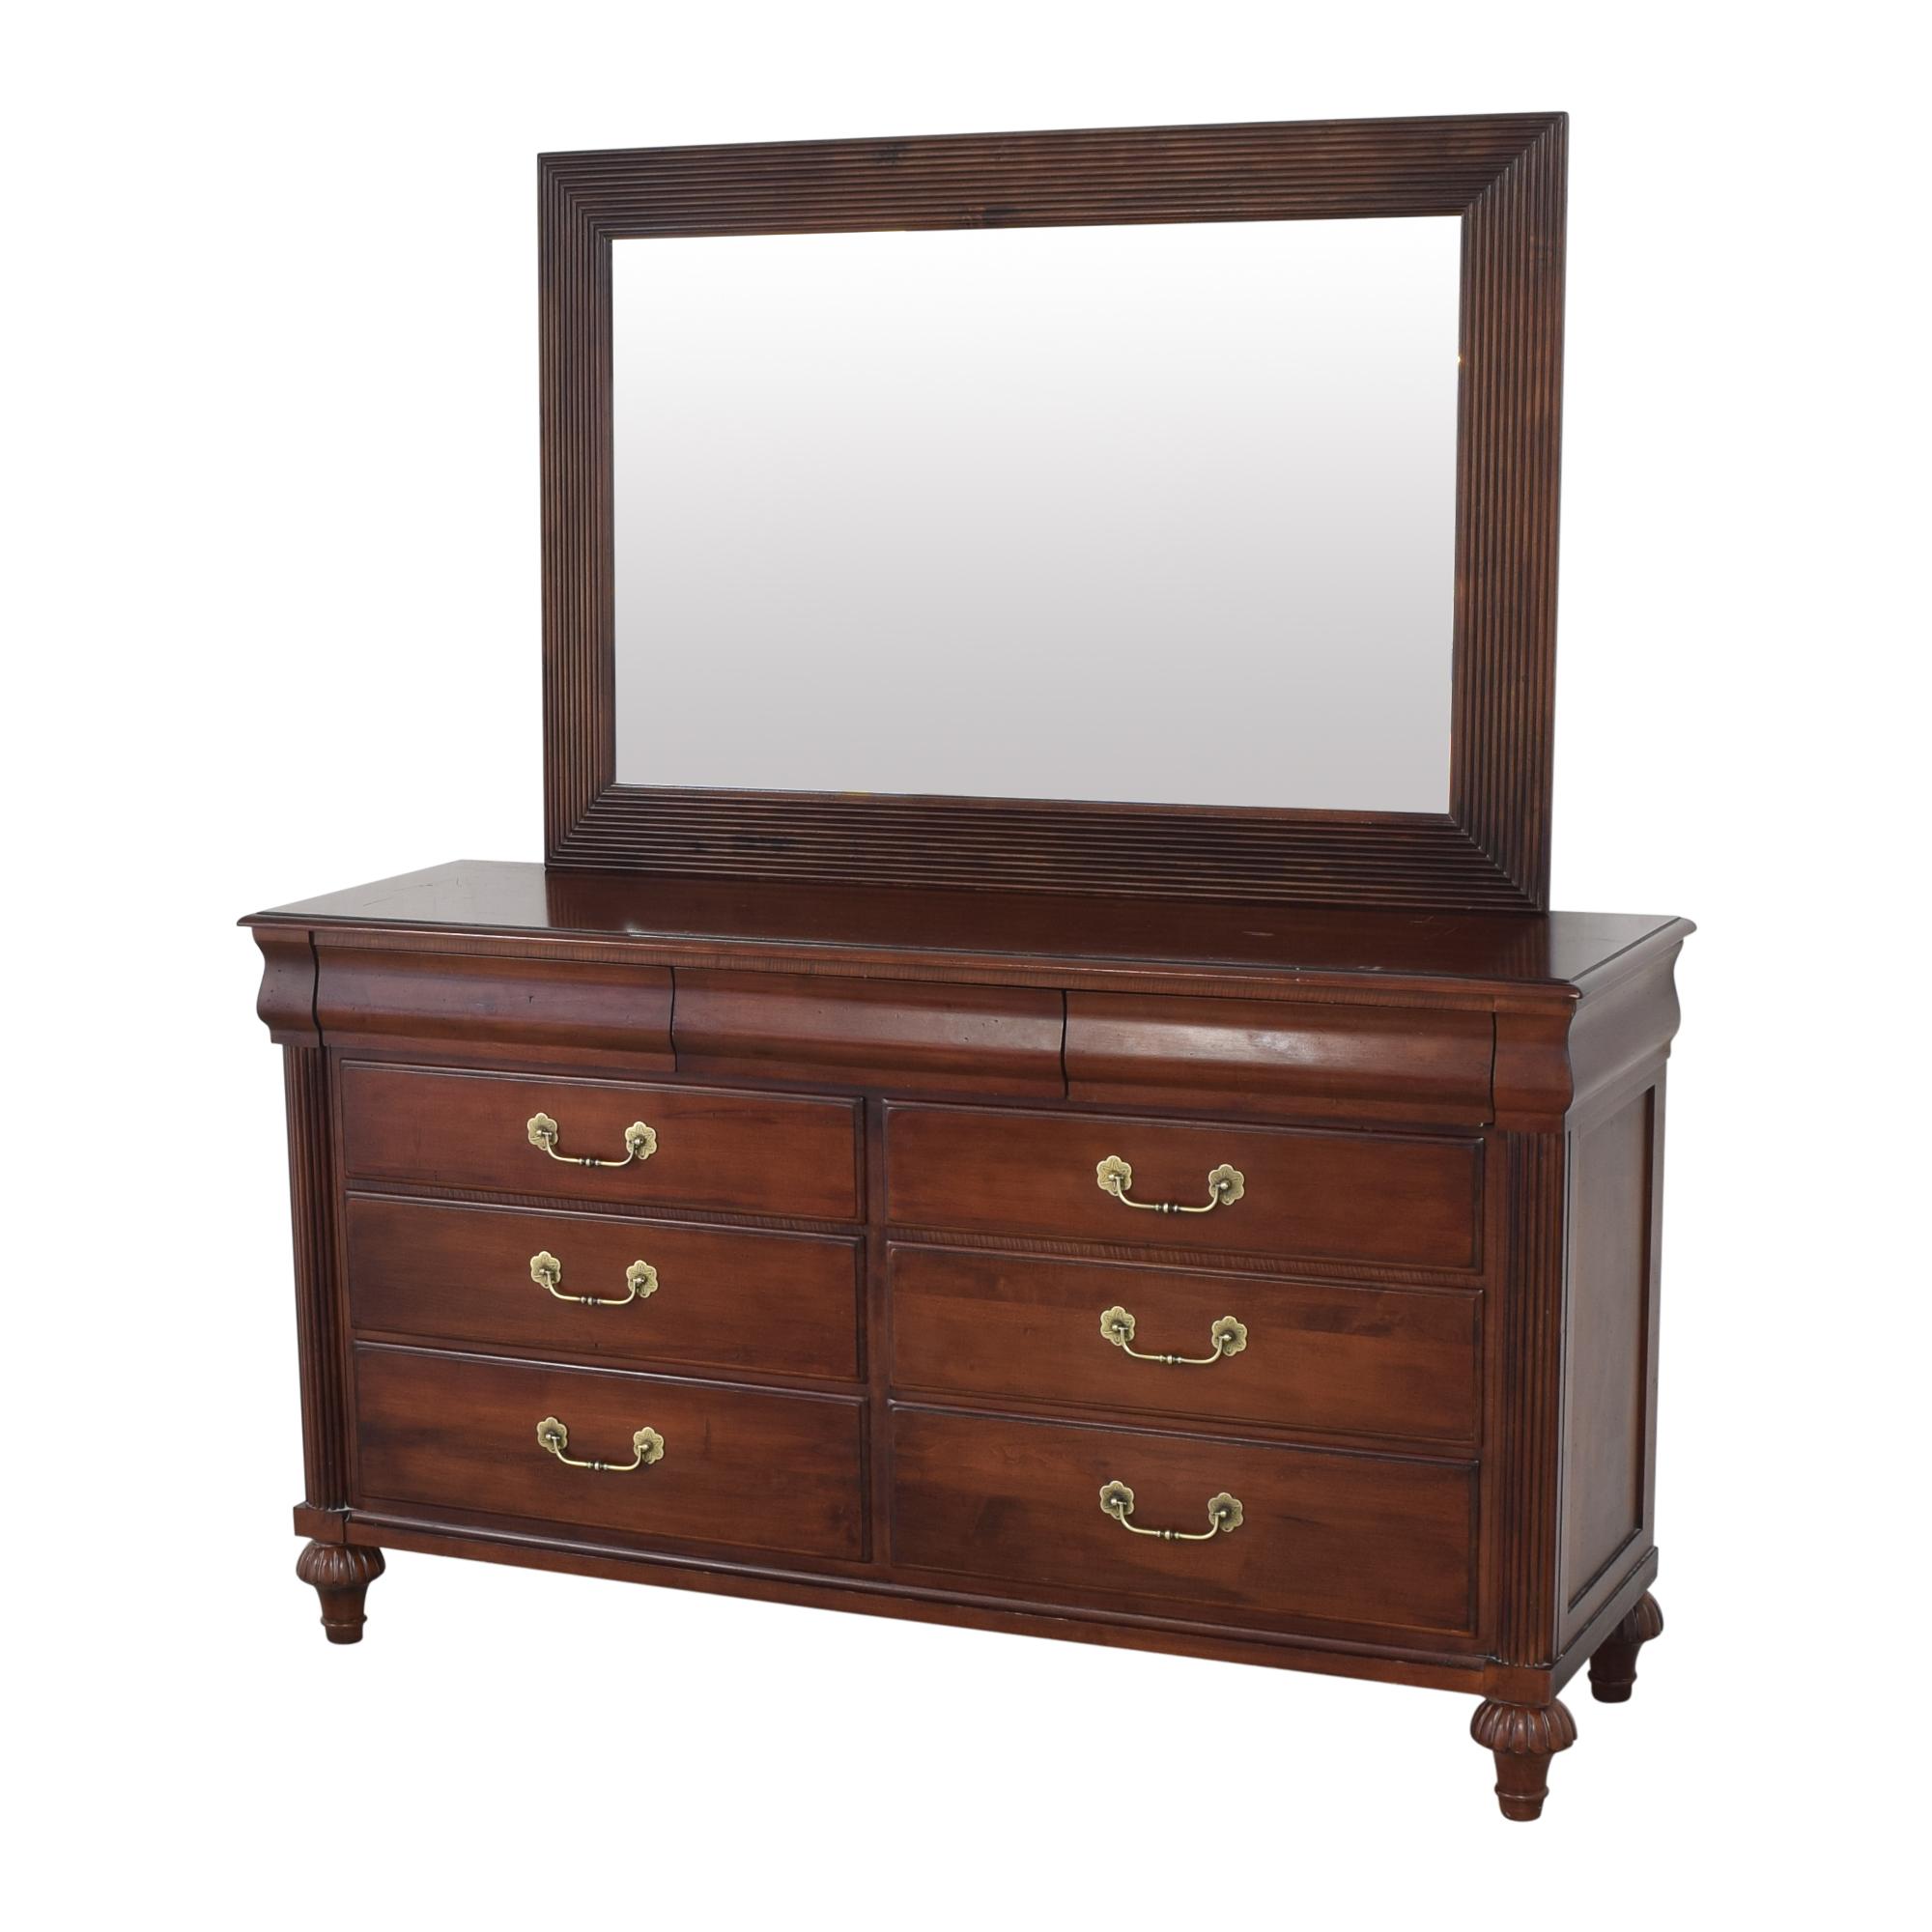 Ethan Allen Ethan Allen British Classics Marques Dresser with Mirror pa